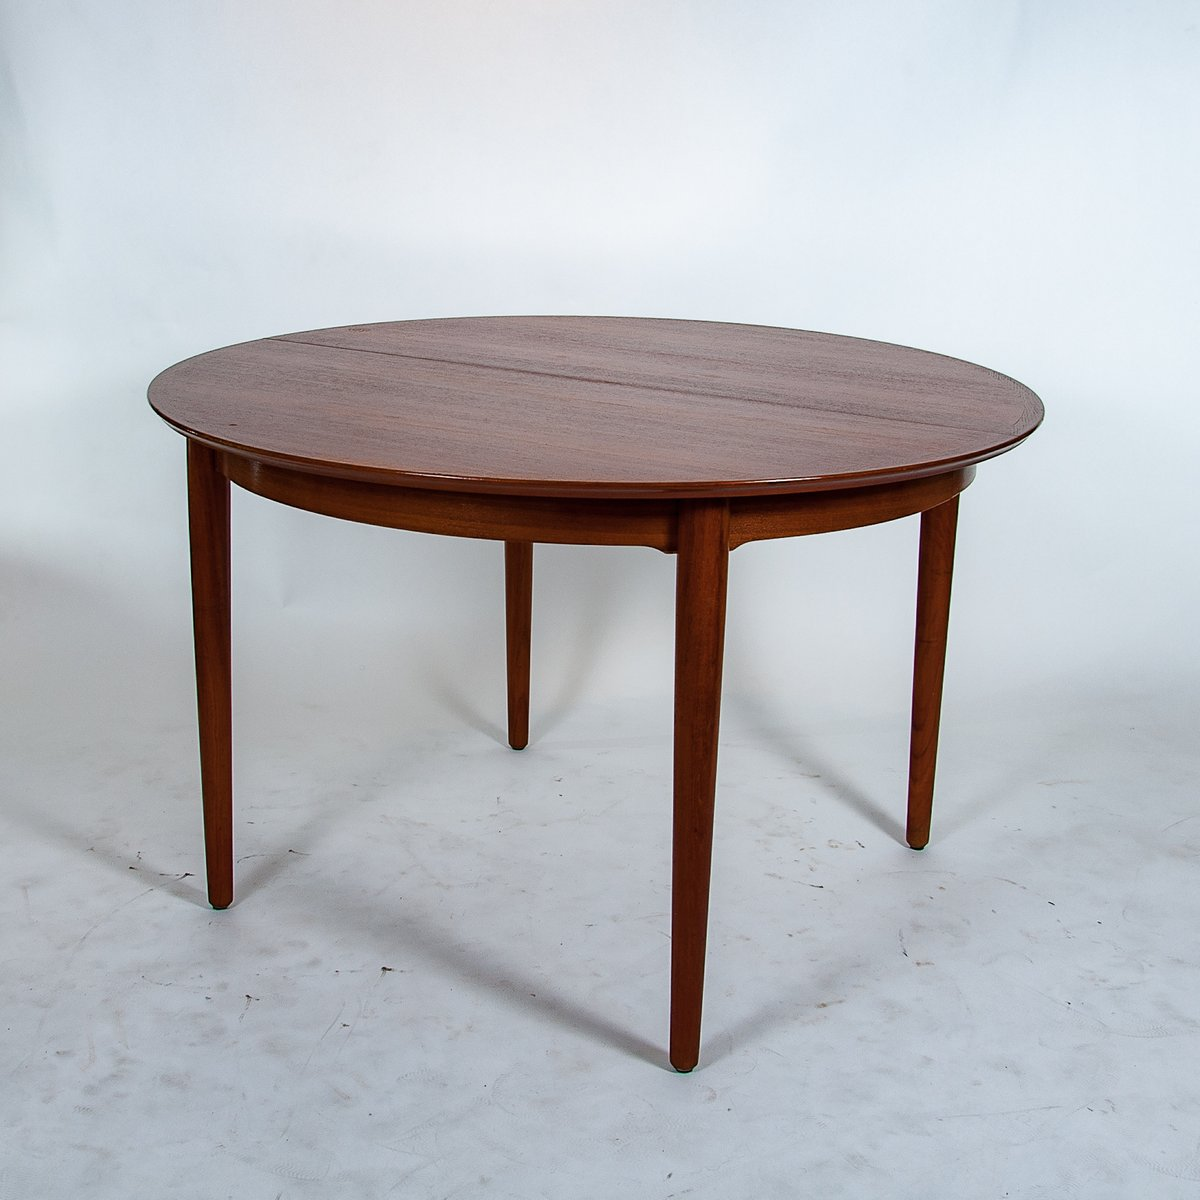 Mid Century Danish Design Dining Table By Arne Vodder For Sibast 1960s